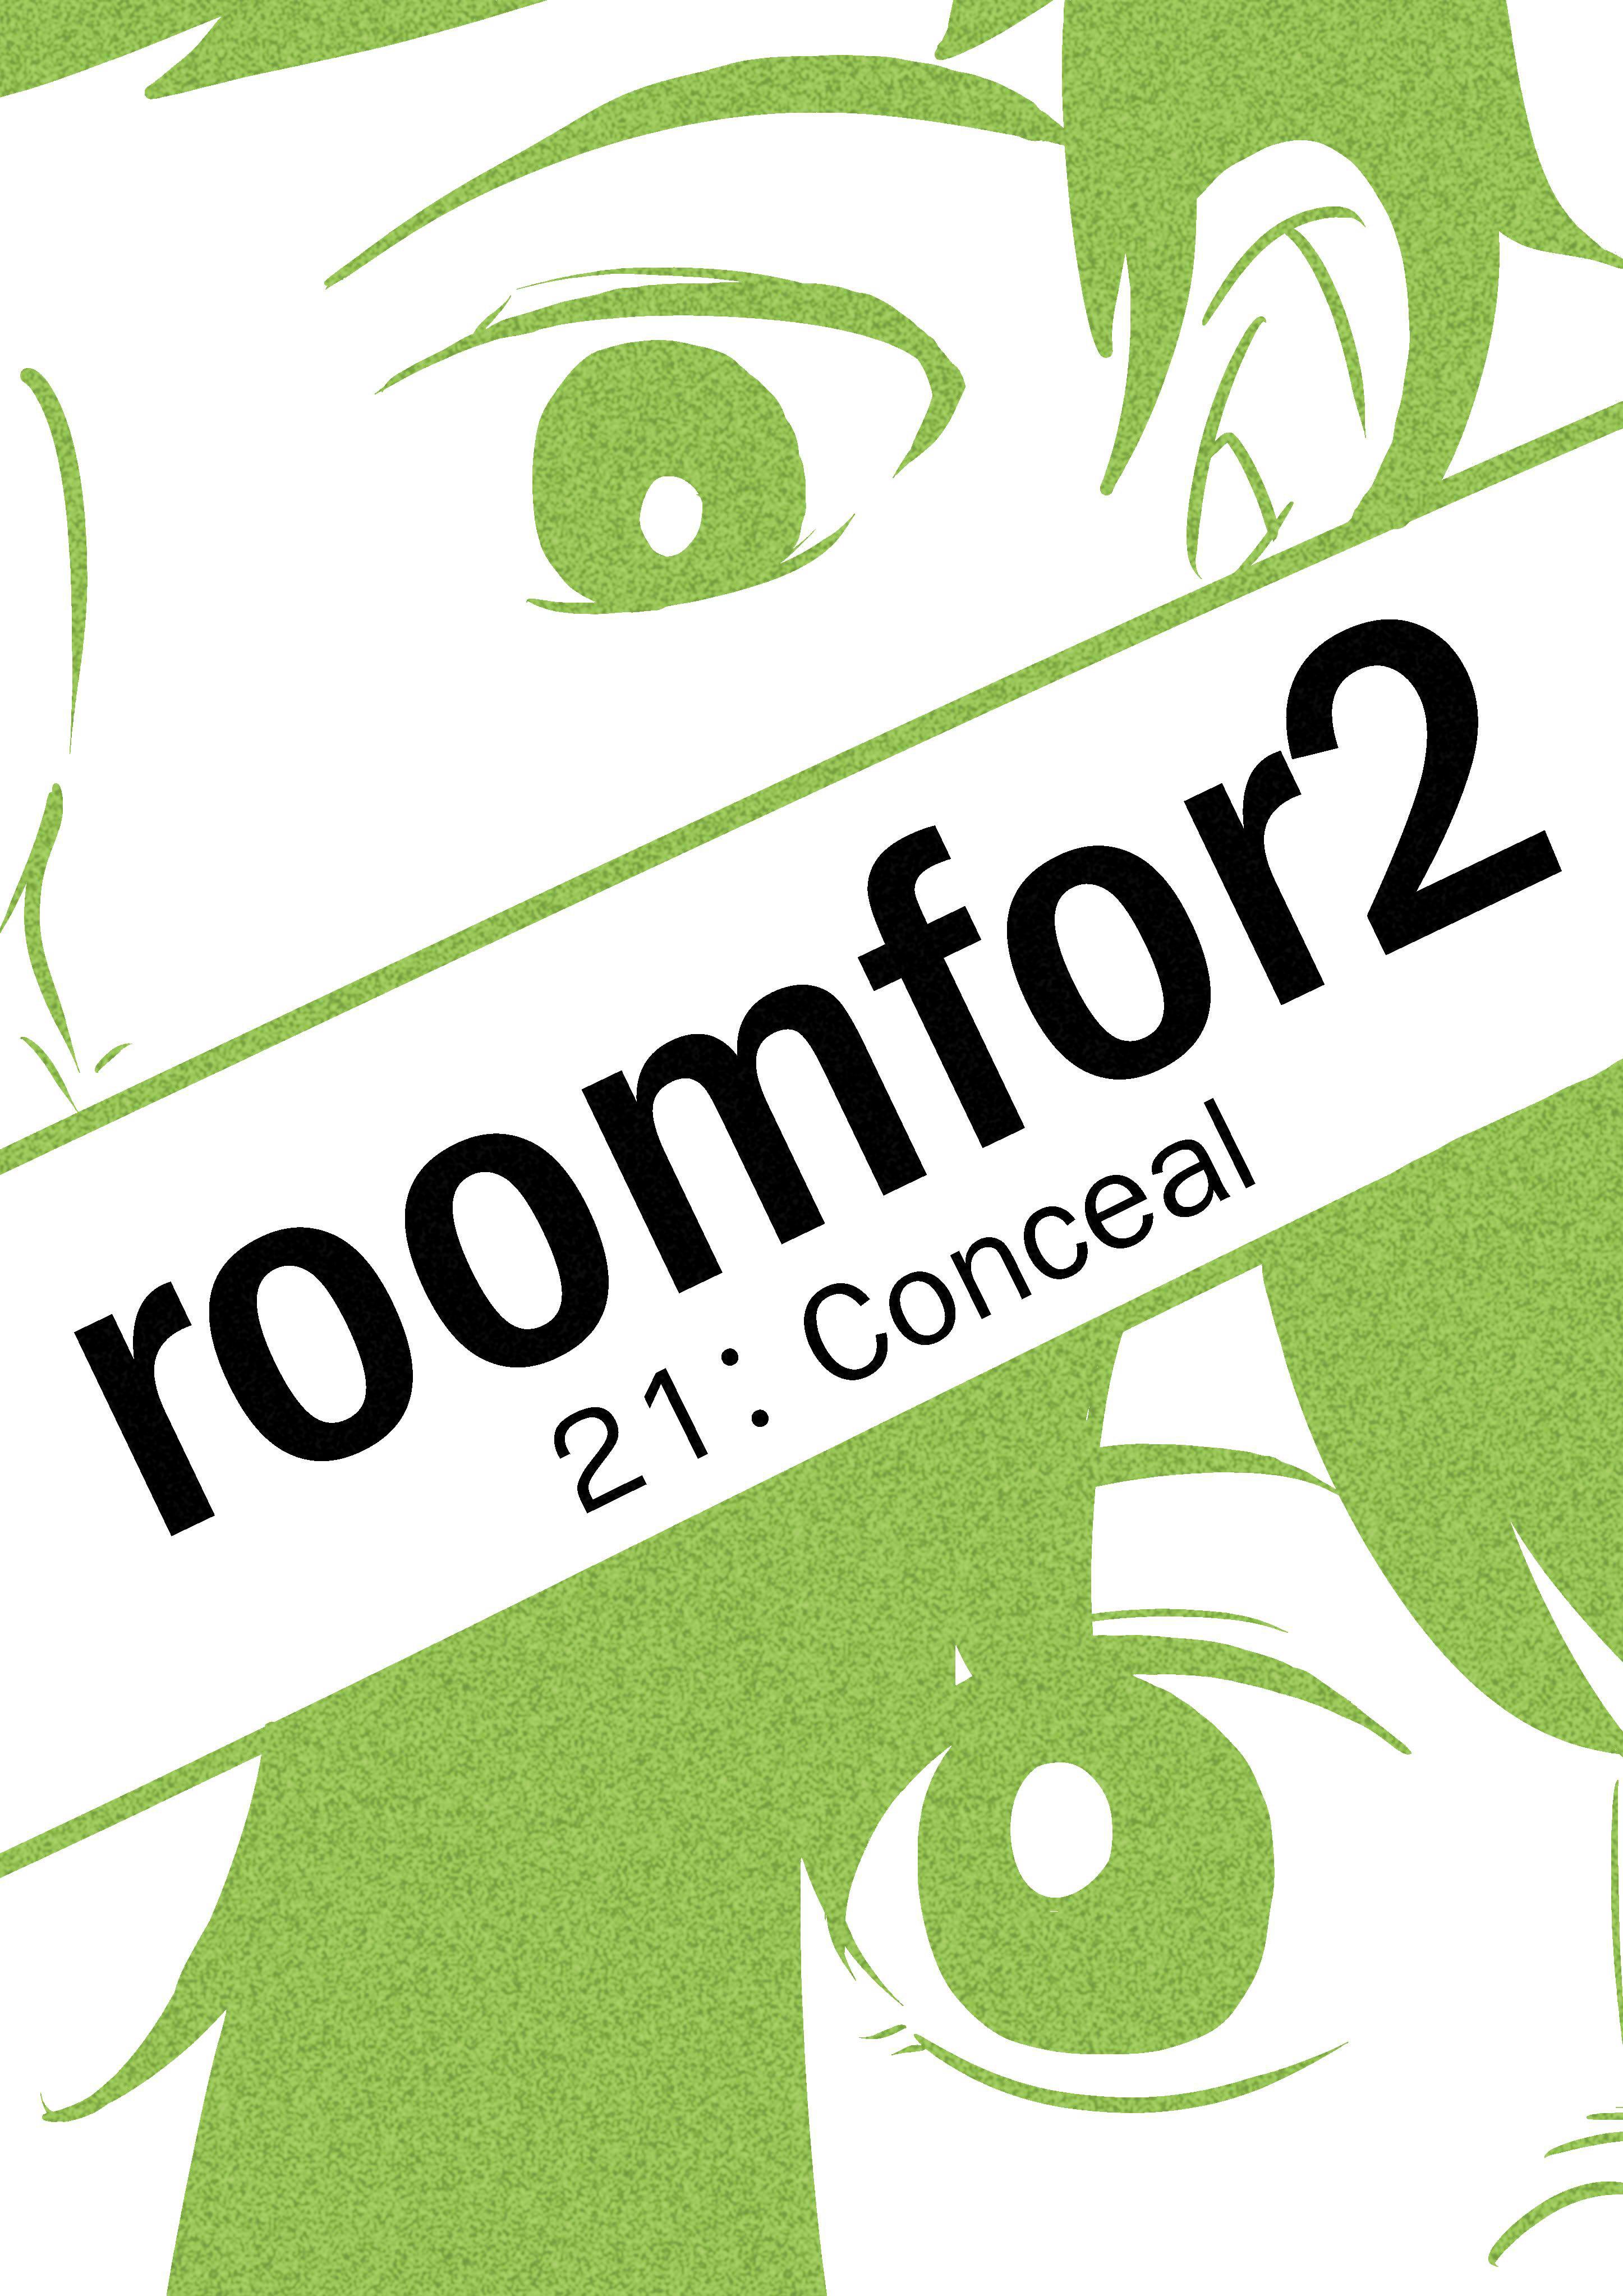 21: Conceal